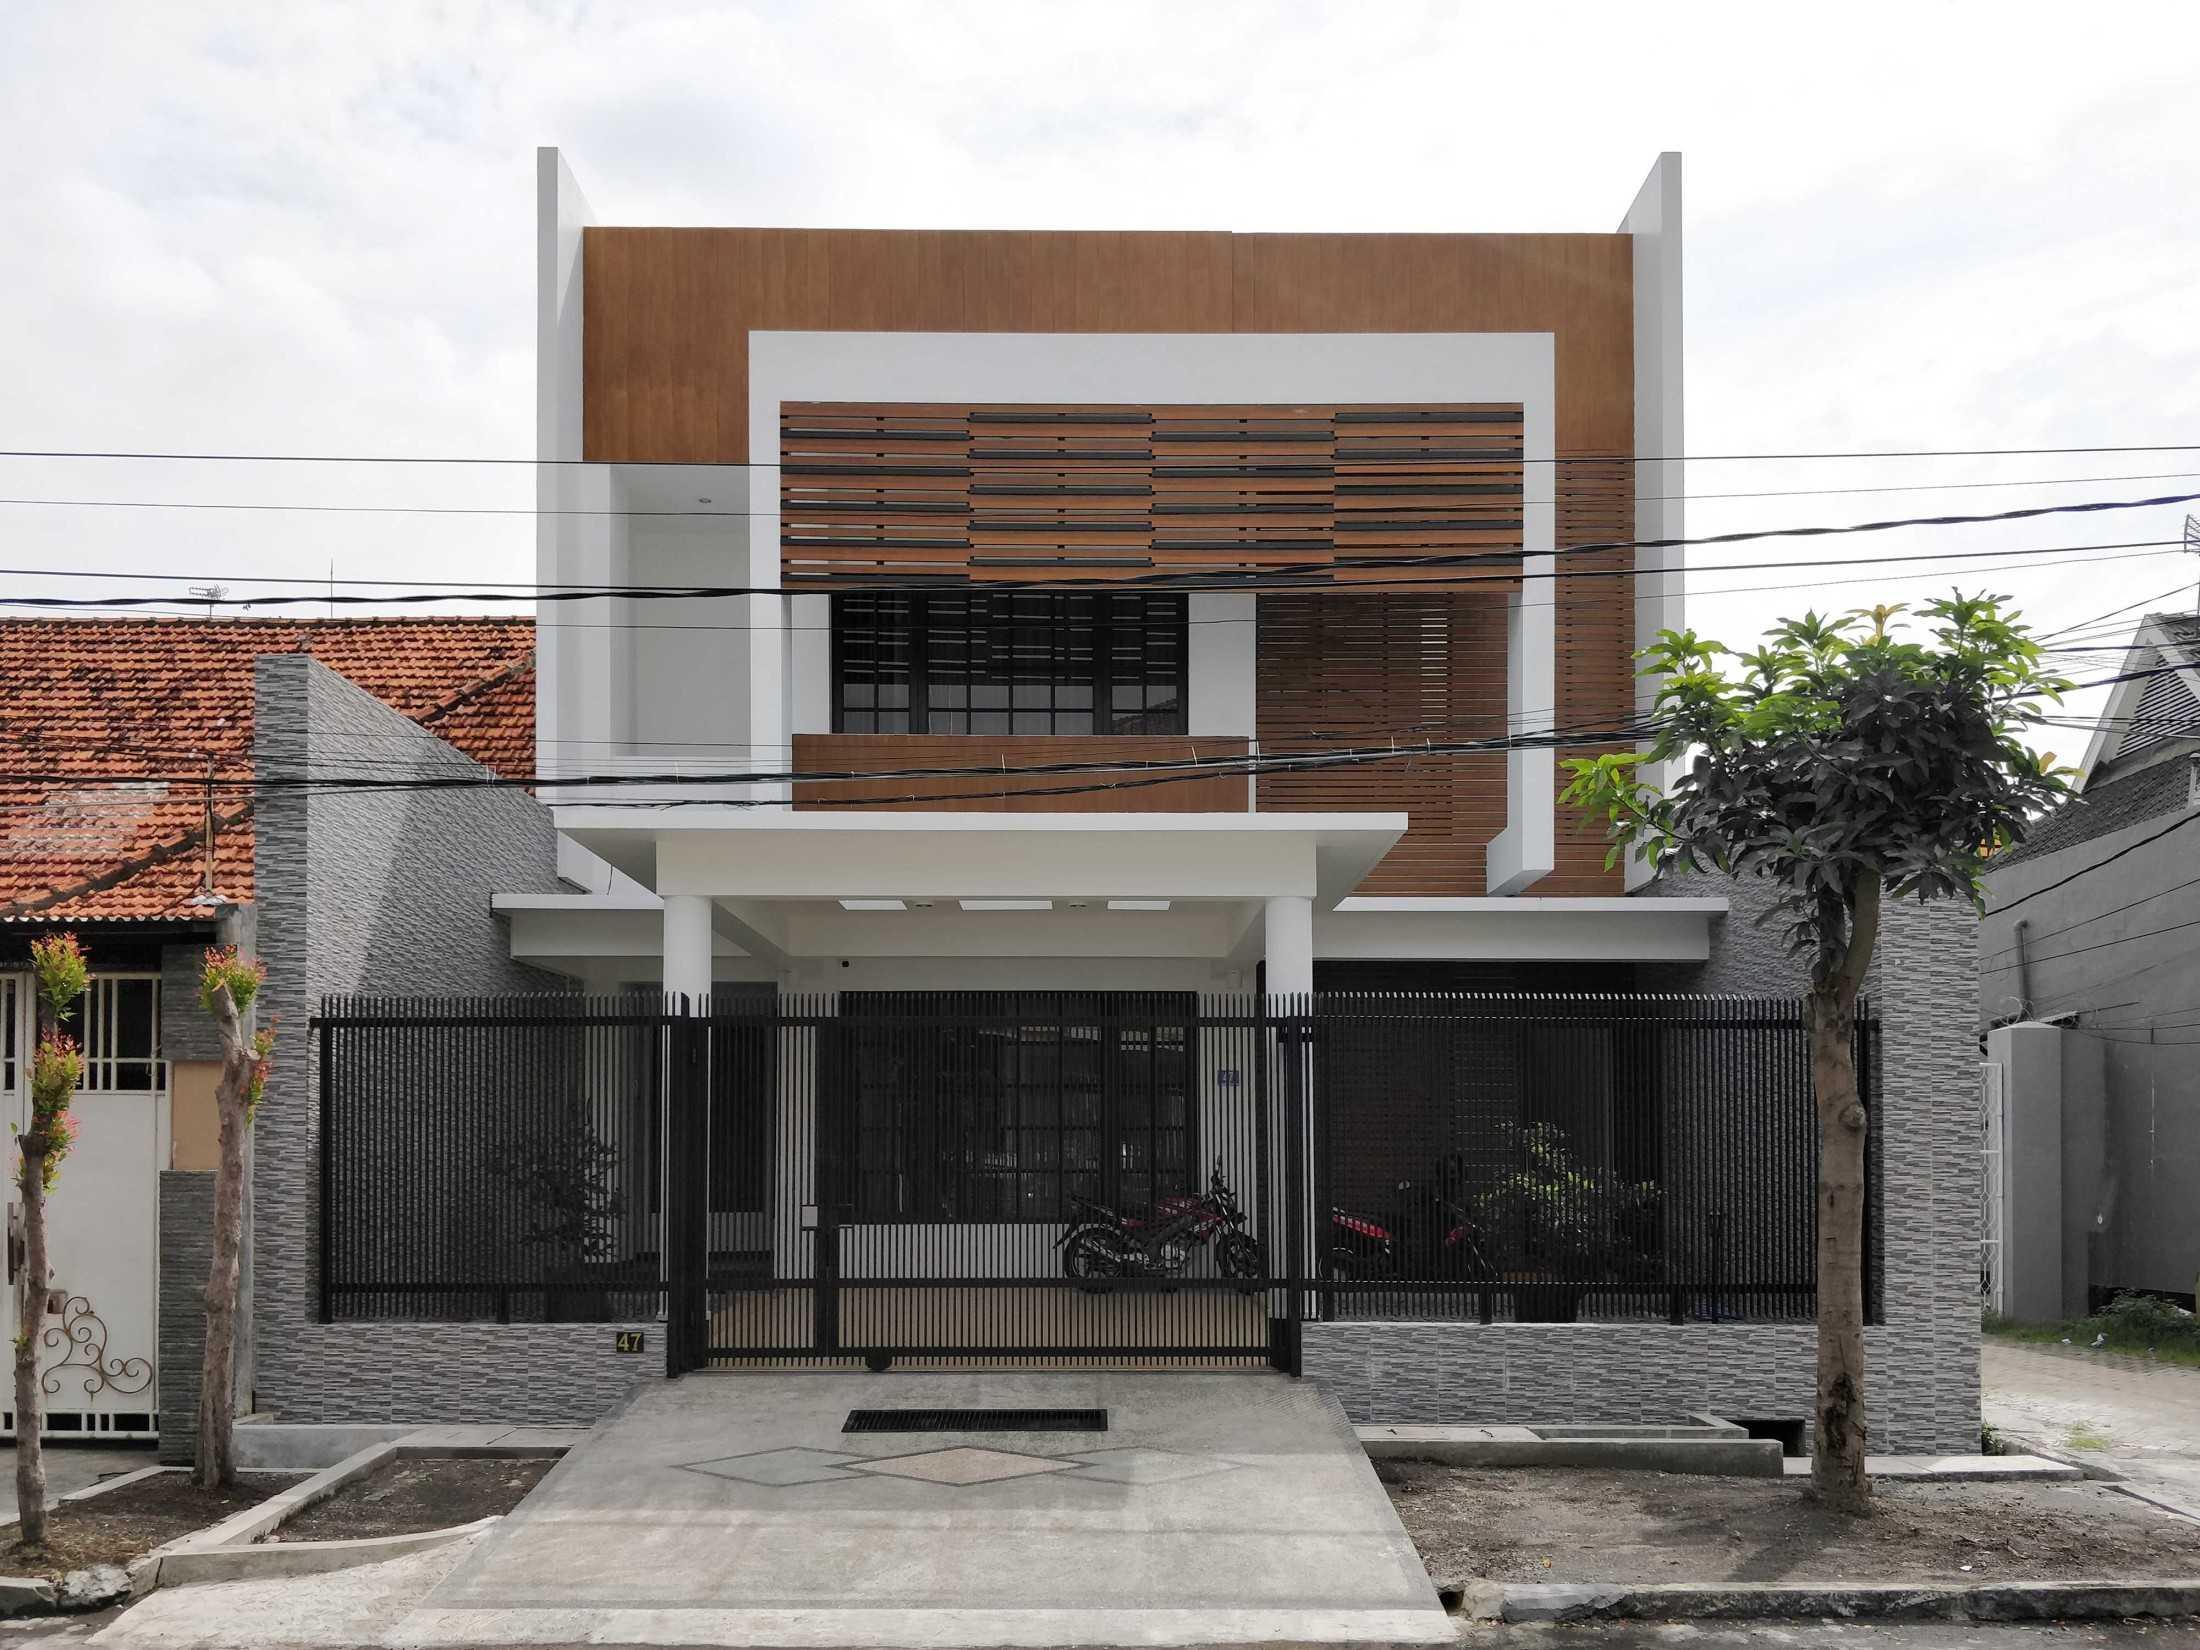 Bramasta Redy Rumah Seruni Surabaya, Kota Sby, Jawa Timur, Indonesia Surabaya, Kota Sby, Jawa Timur, Indonesia Bramasta-Redy-Rumah-Seruni  94617